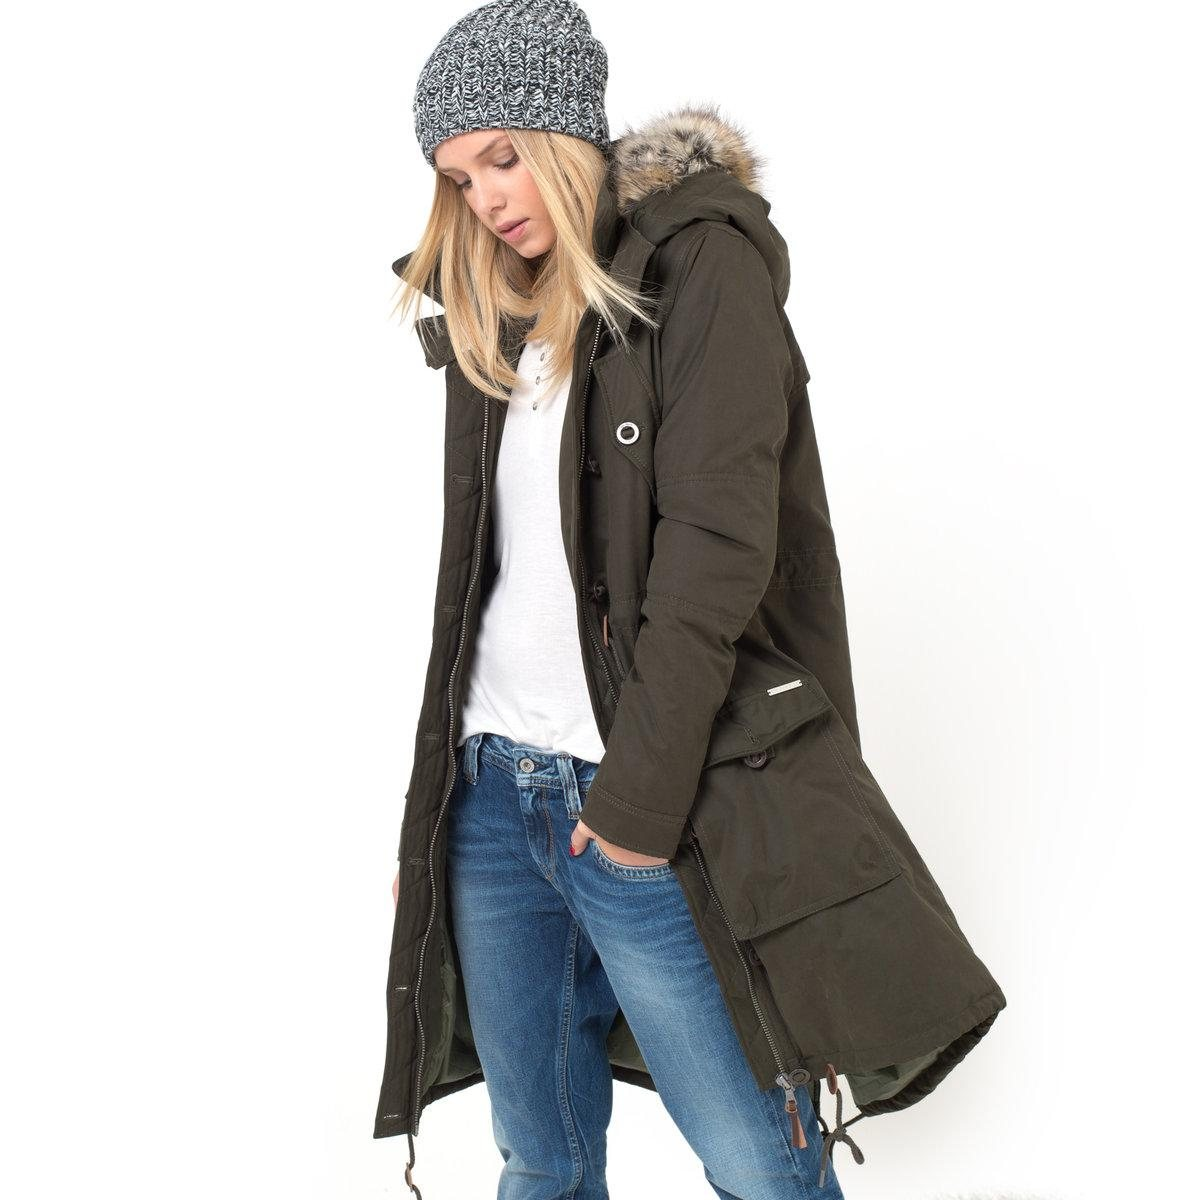 parka pepe jeans parka femme pepe jeans la redoute. Black Bedroom Furniture Sets. Home Design Ideas